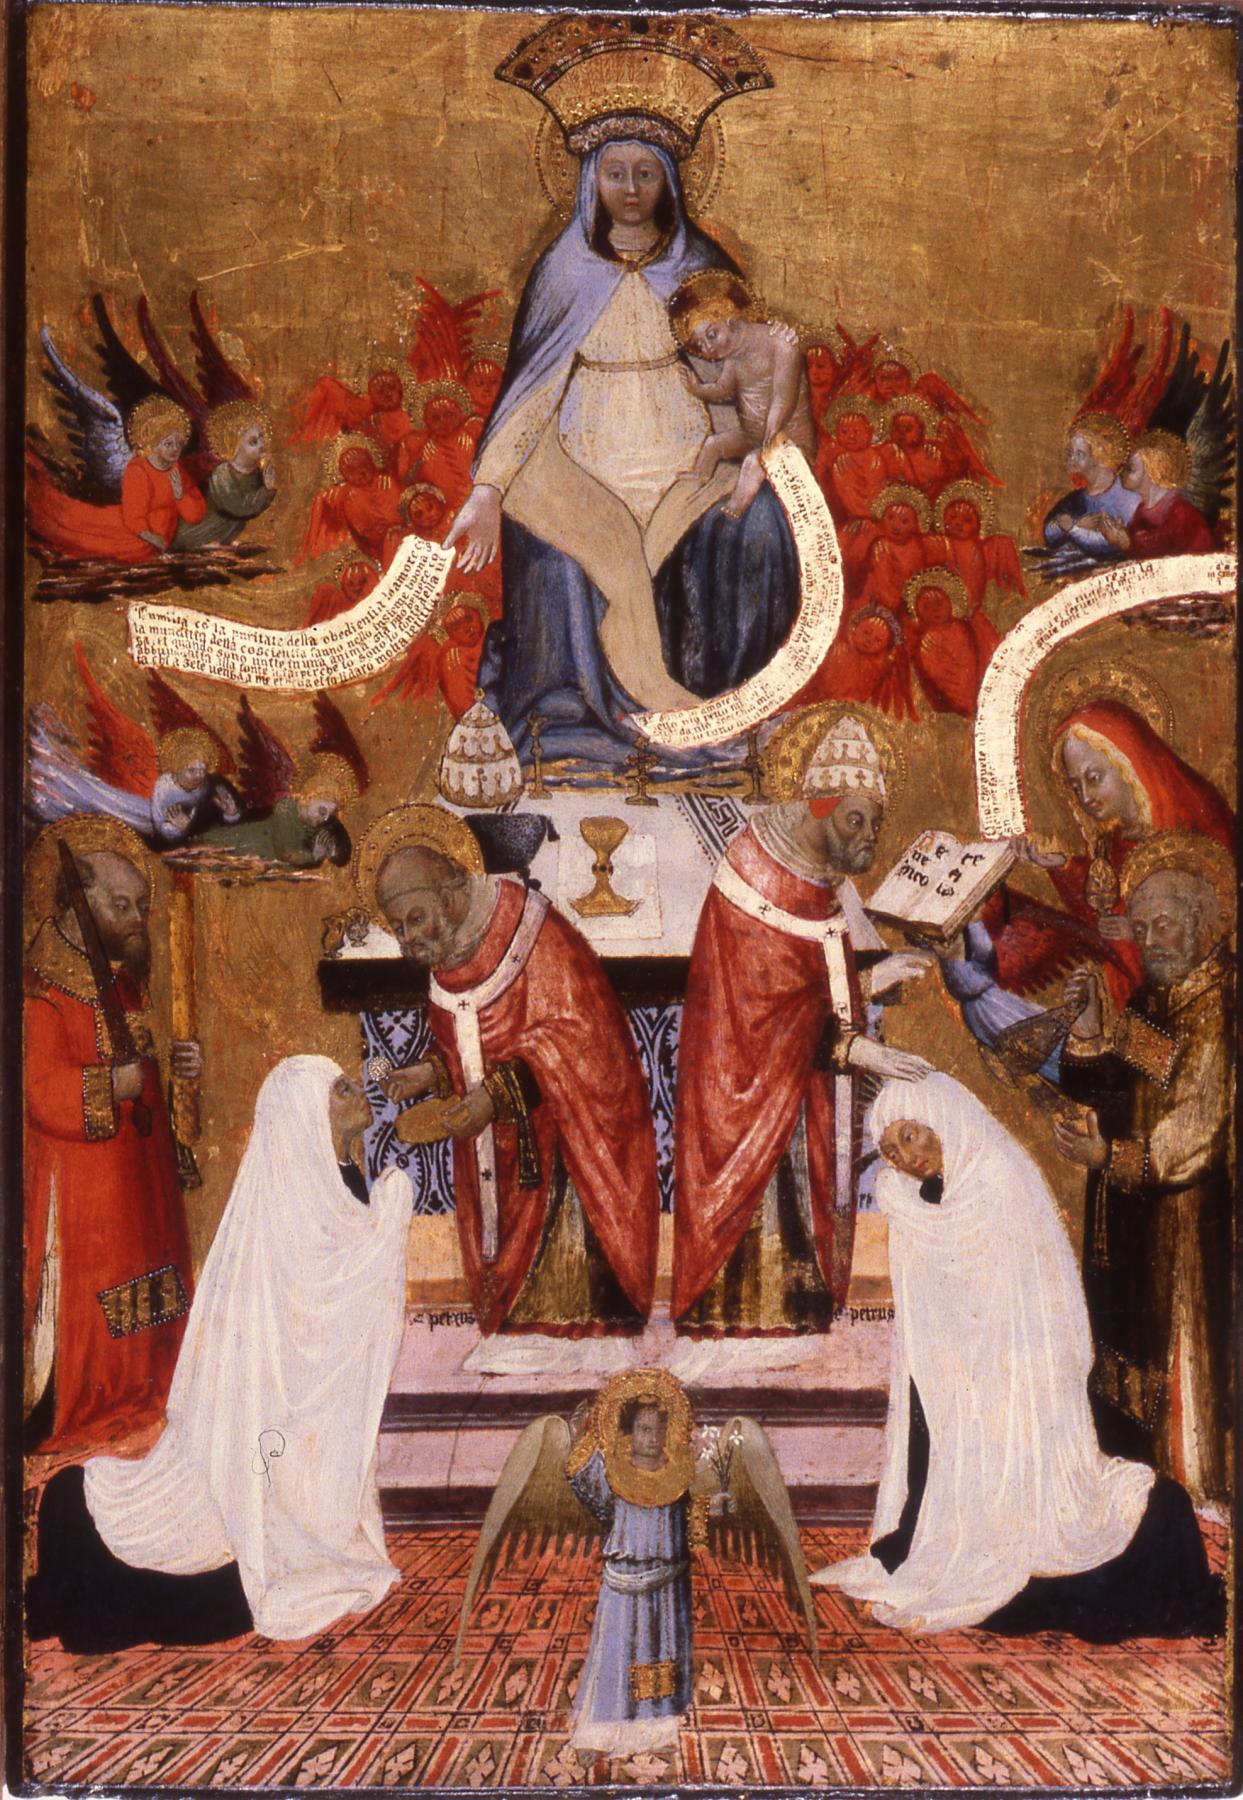 File:Italian - The Vision of Saint Francesca of Rome - Walters 37742